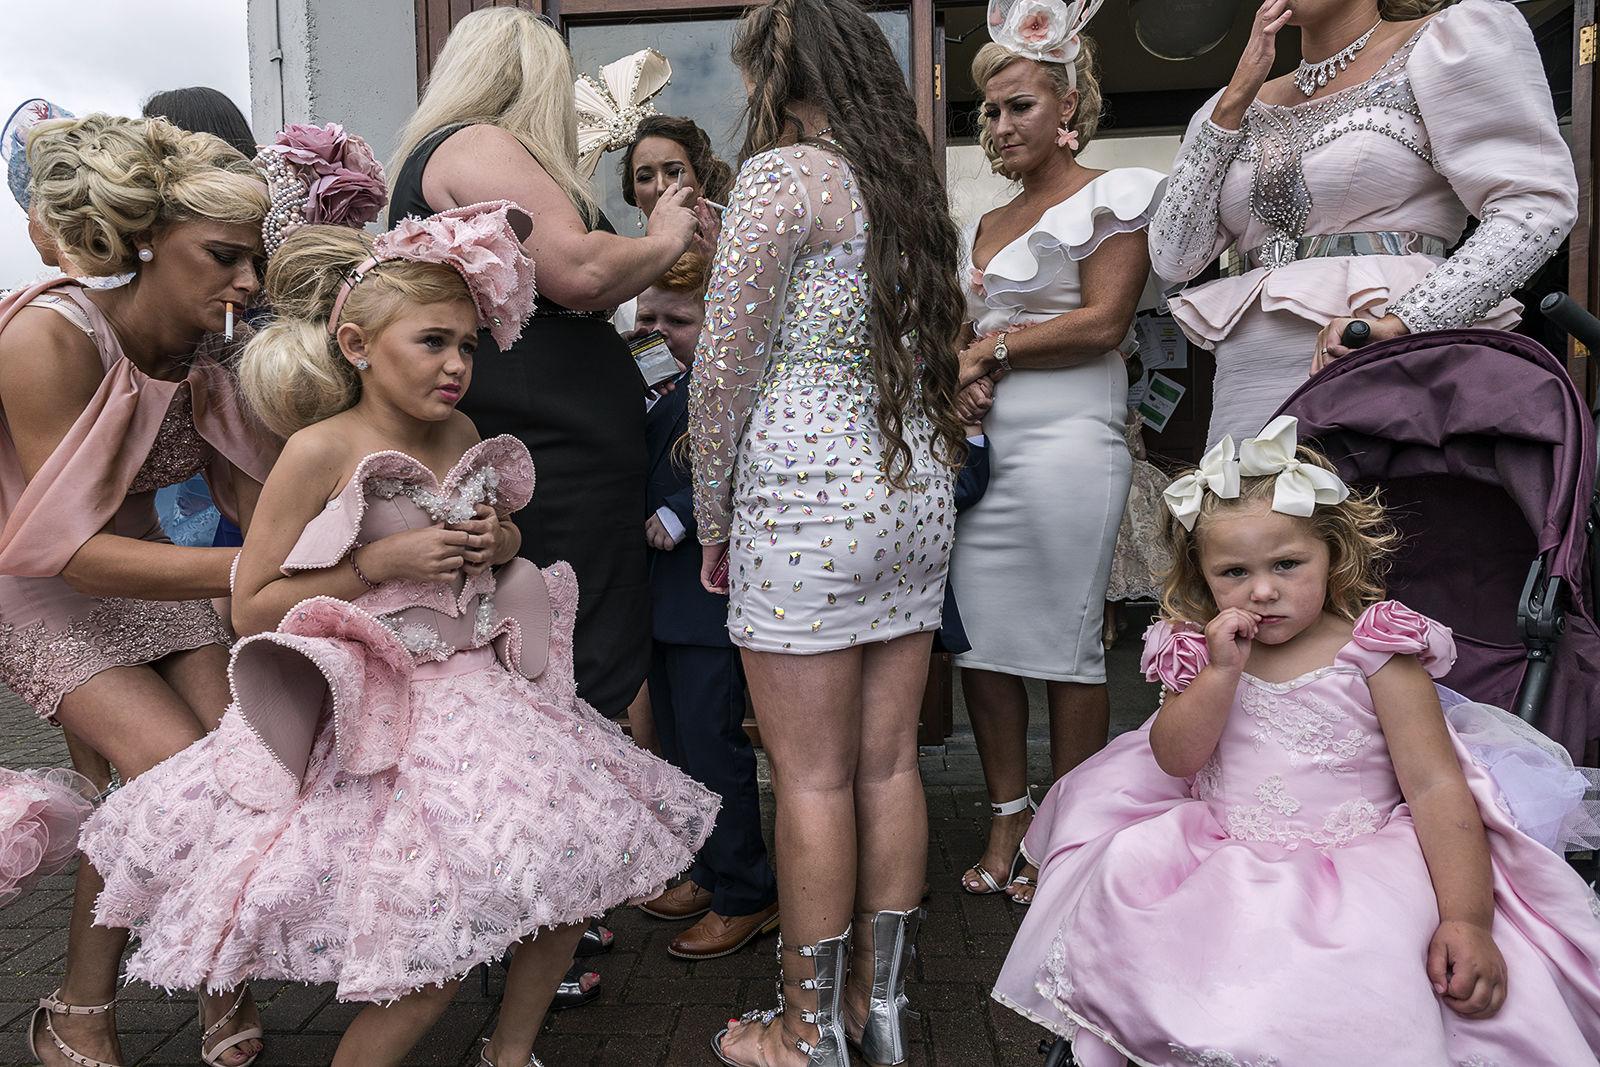 Women and girls gather outside church after an Irish Traveller wedding. Wexford, Ireland 2019